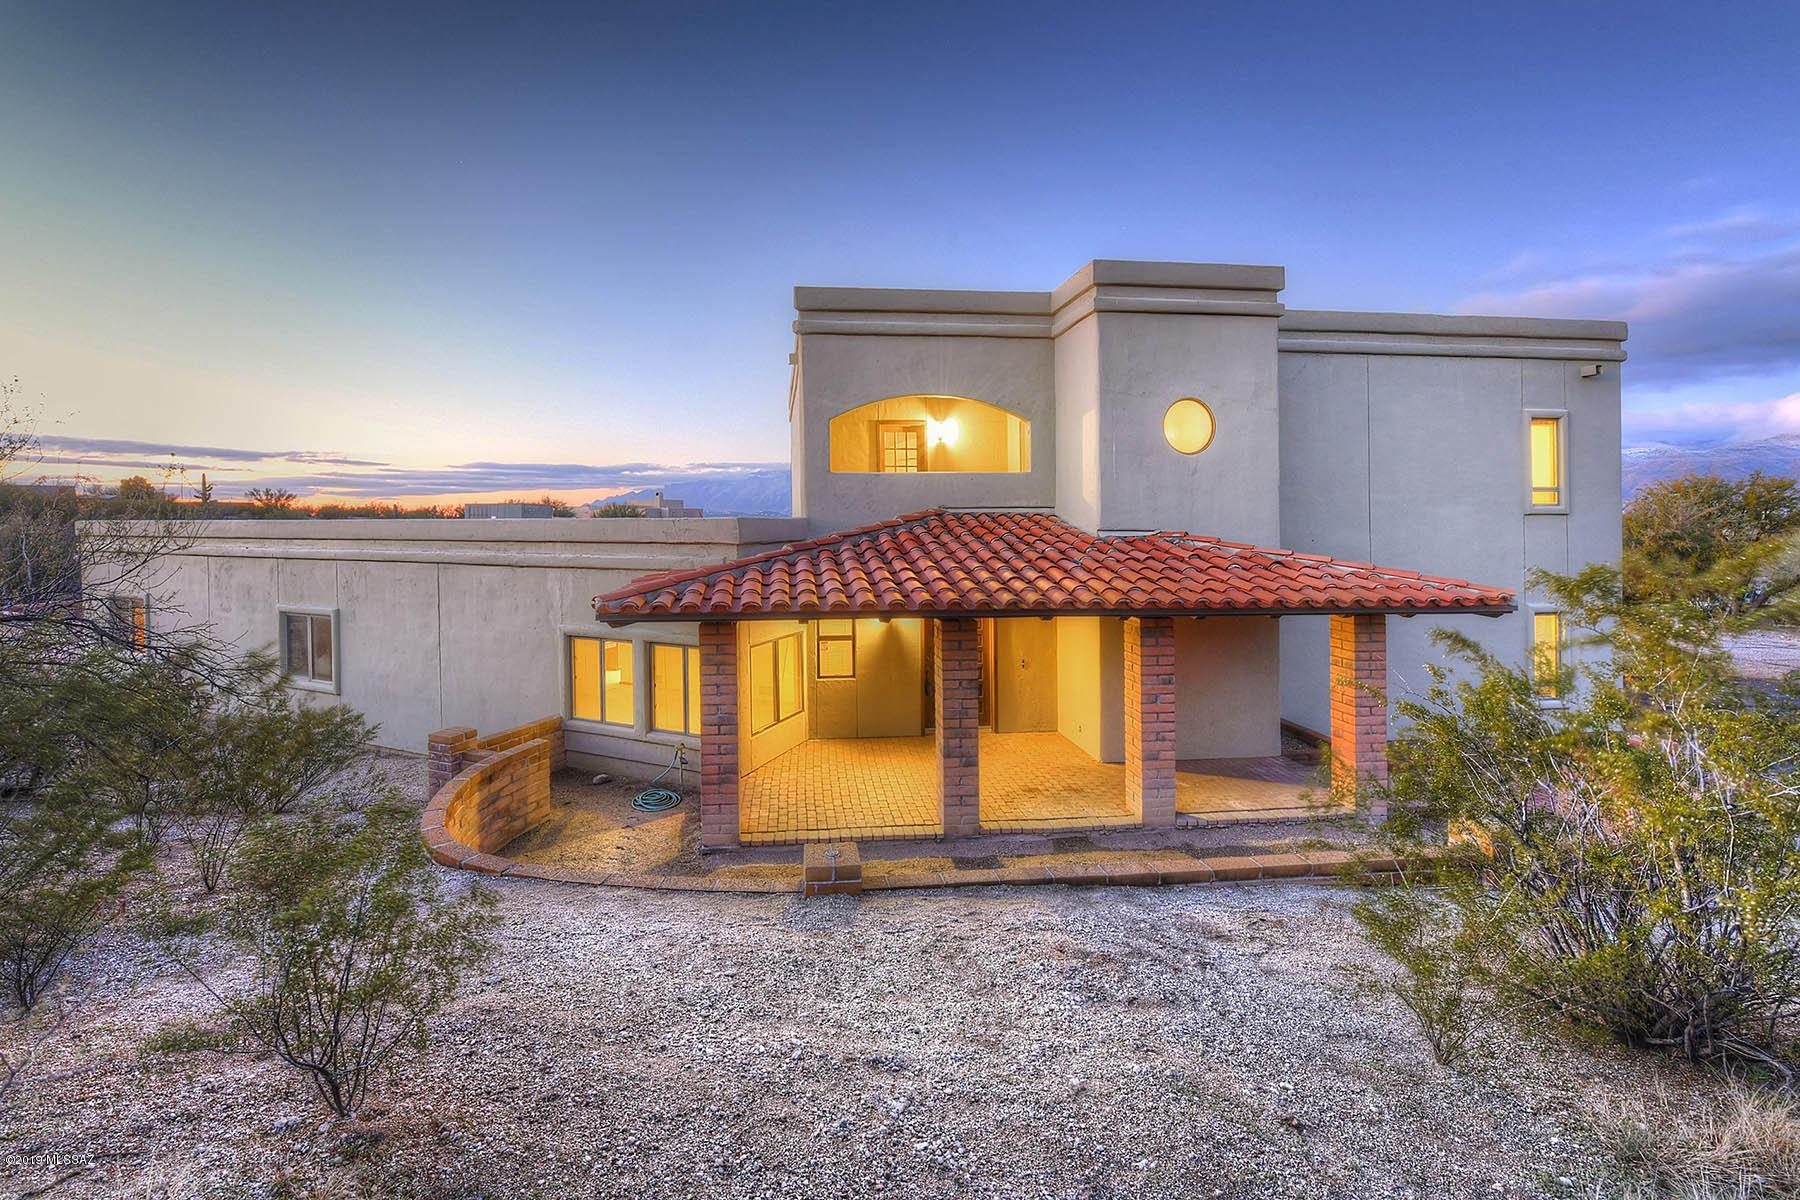 761 N Lazy J Way Tucson, AZ 85748